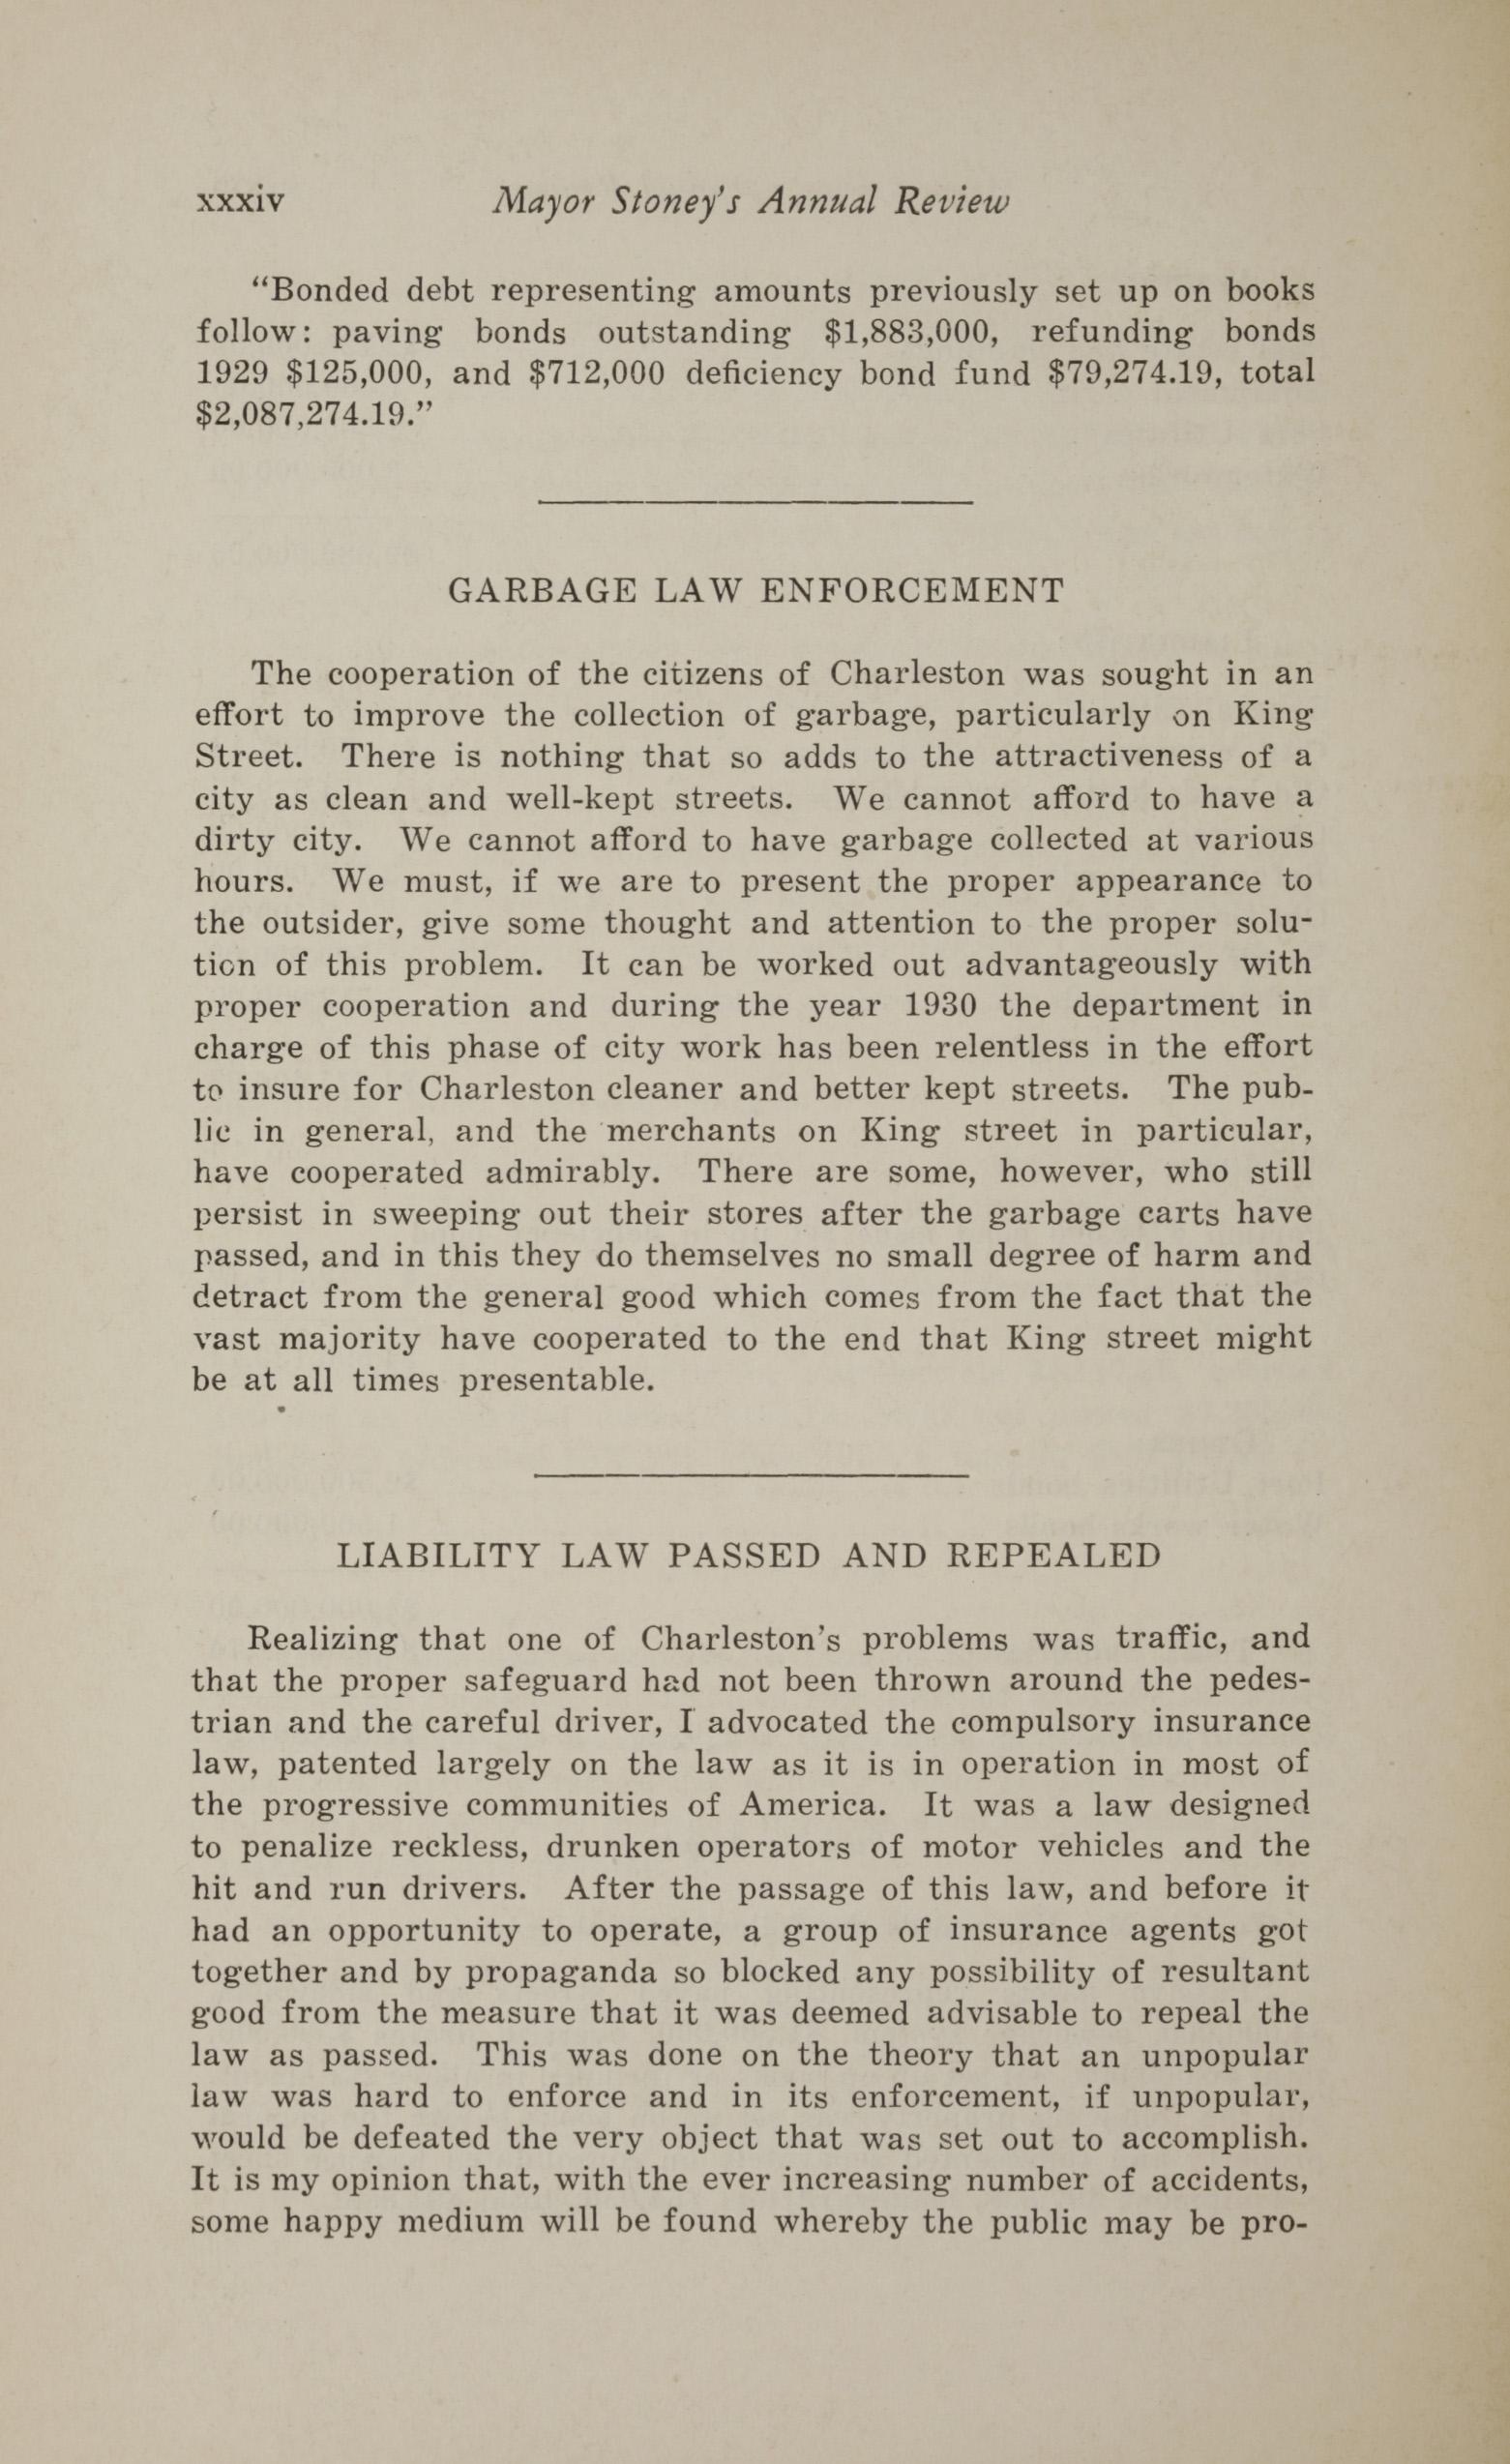 Charleston Yearbook, 1930, page xxxiv